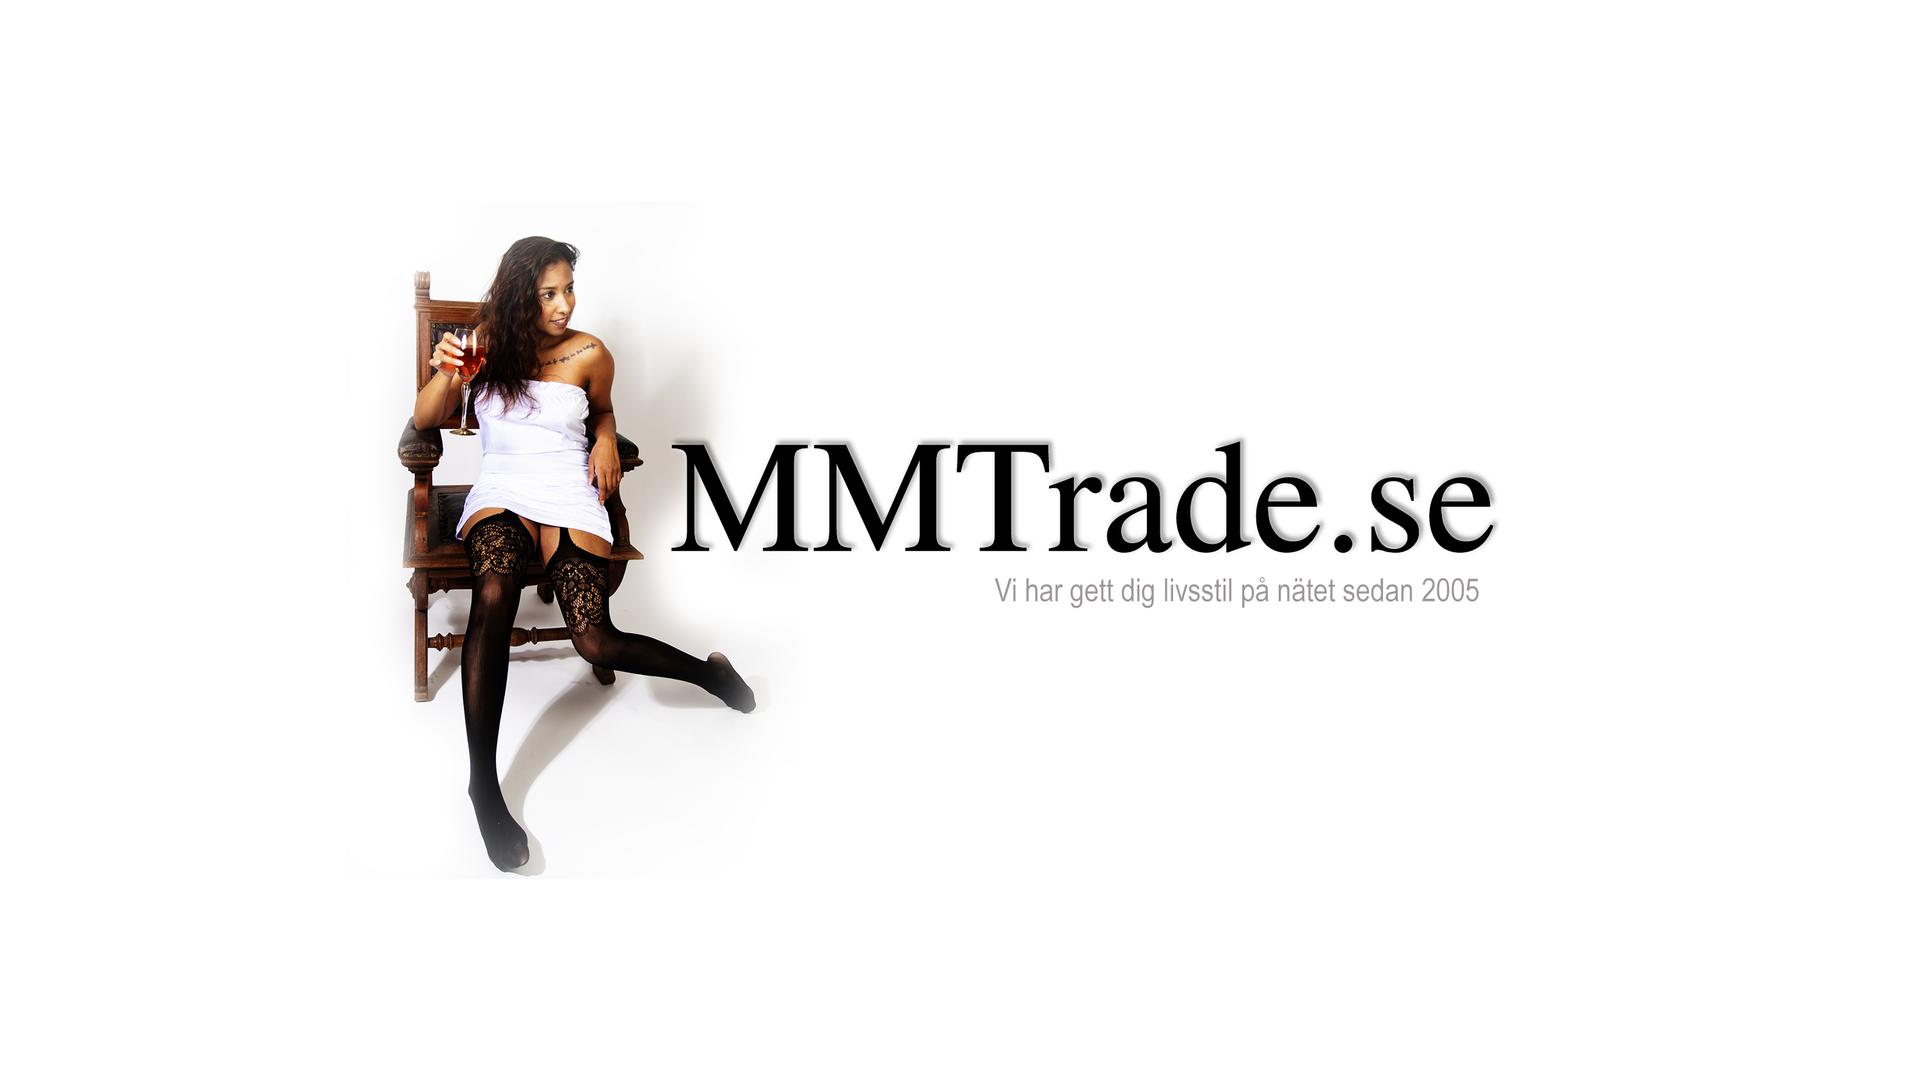 MMTrade Omslagsbild